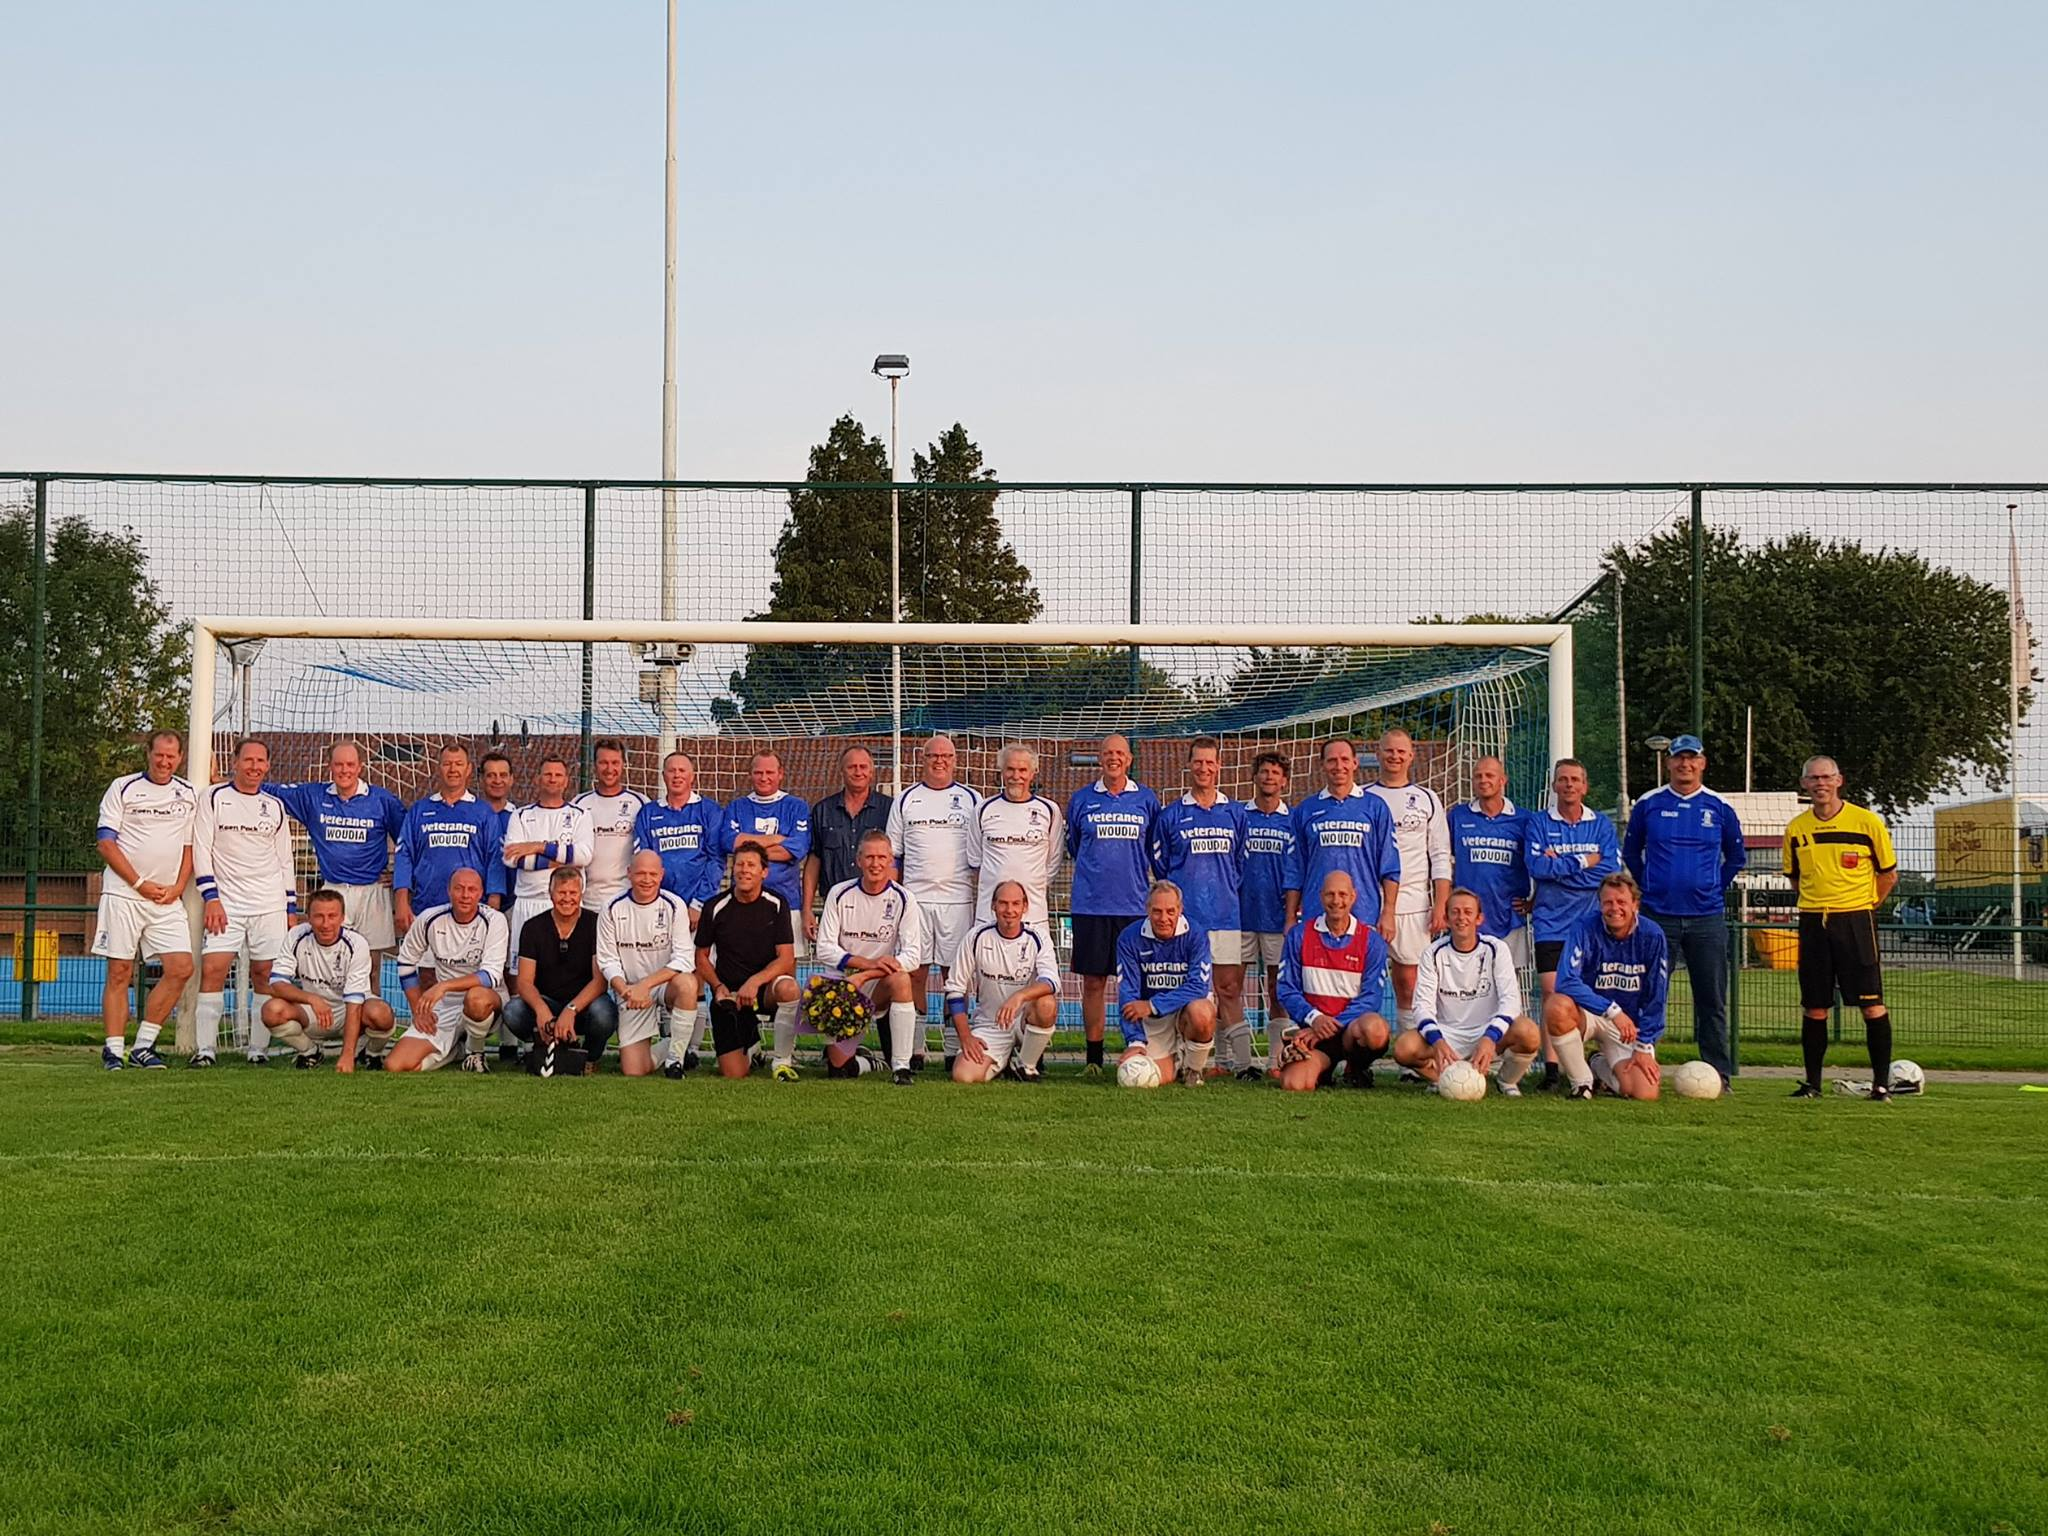 Soccer club Woudia